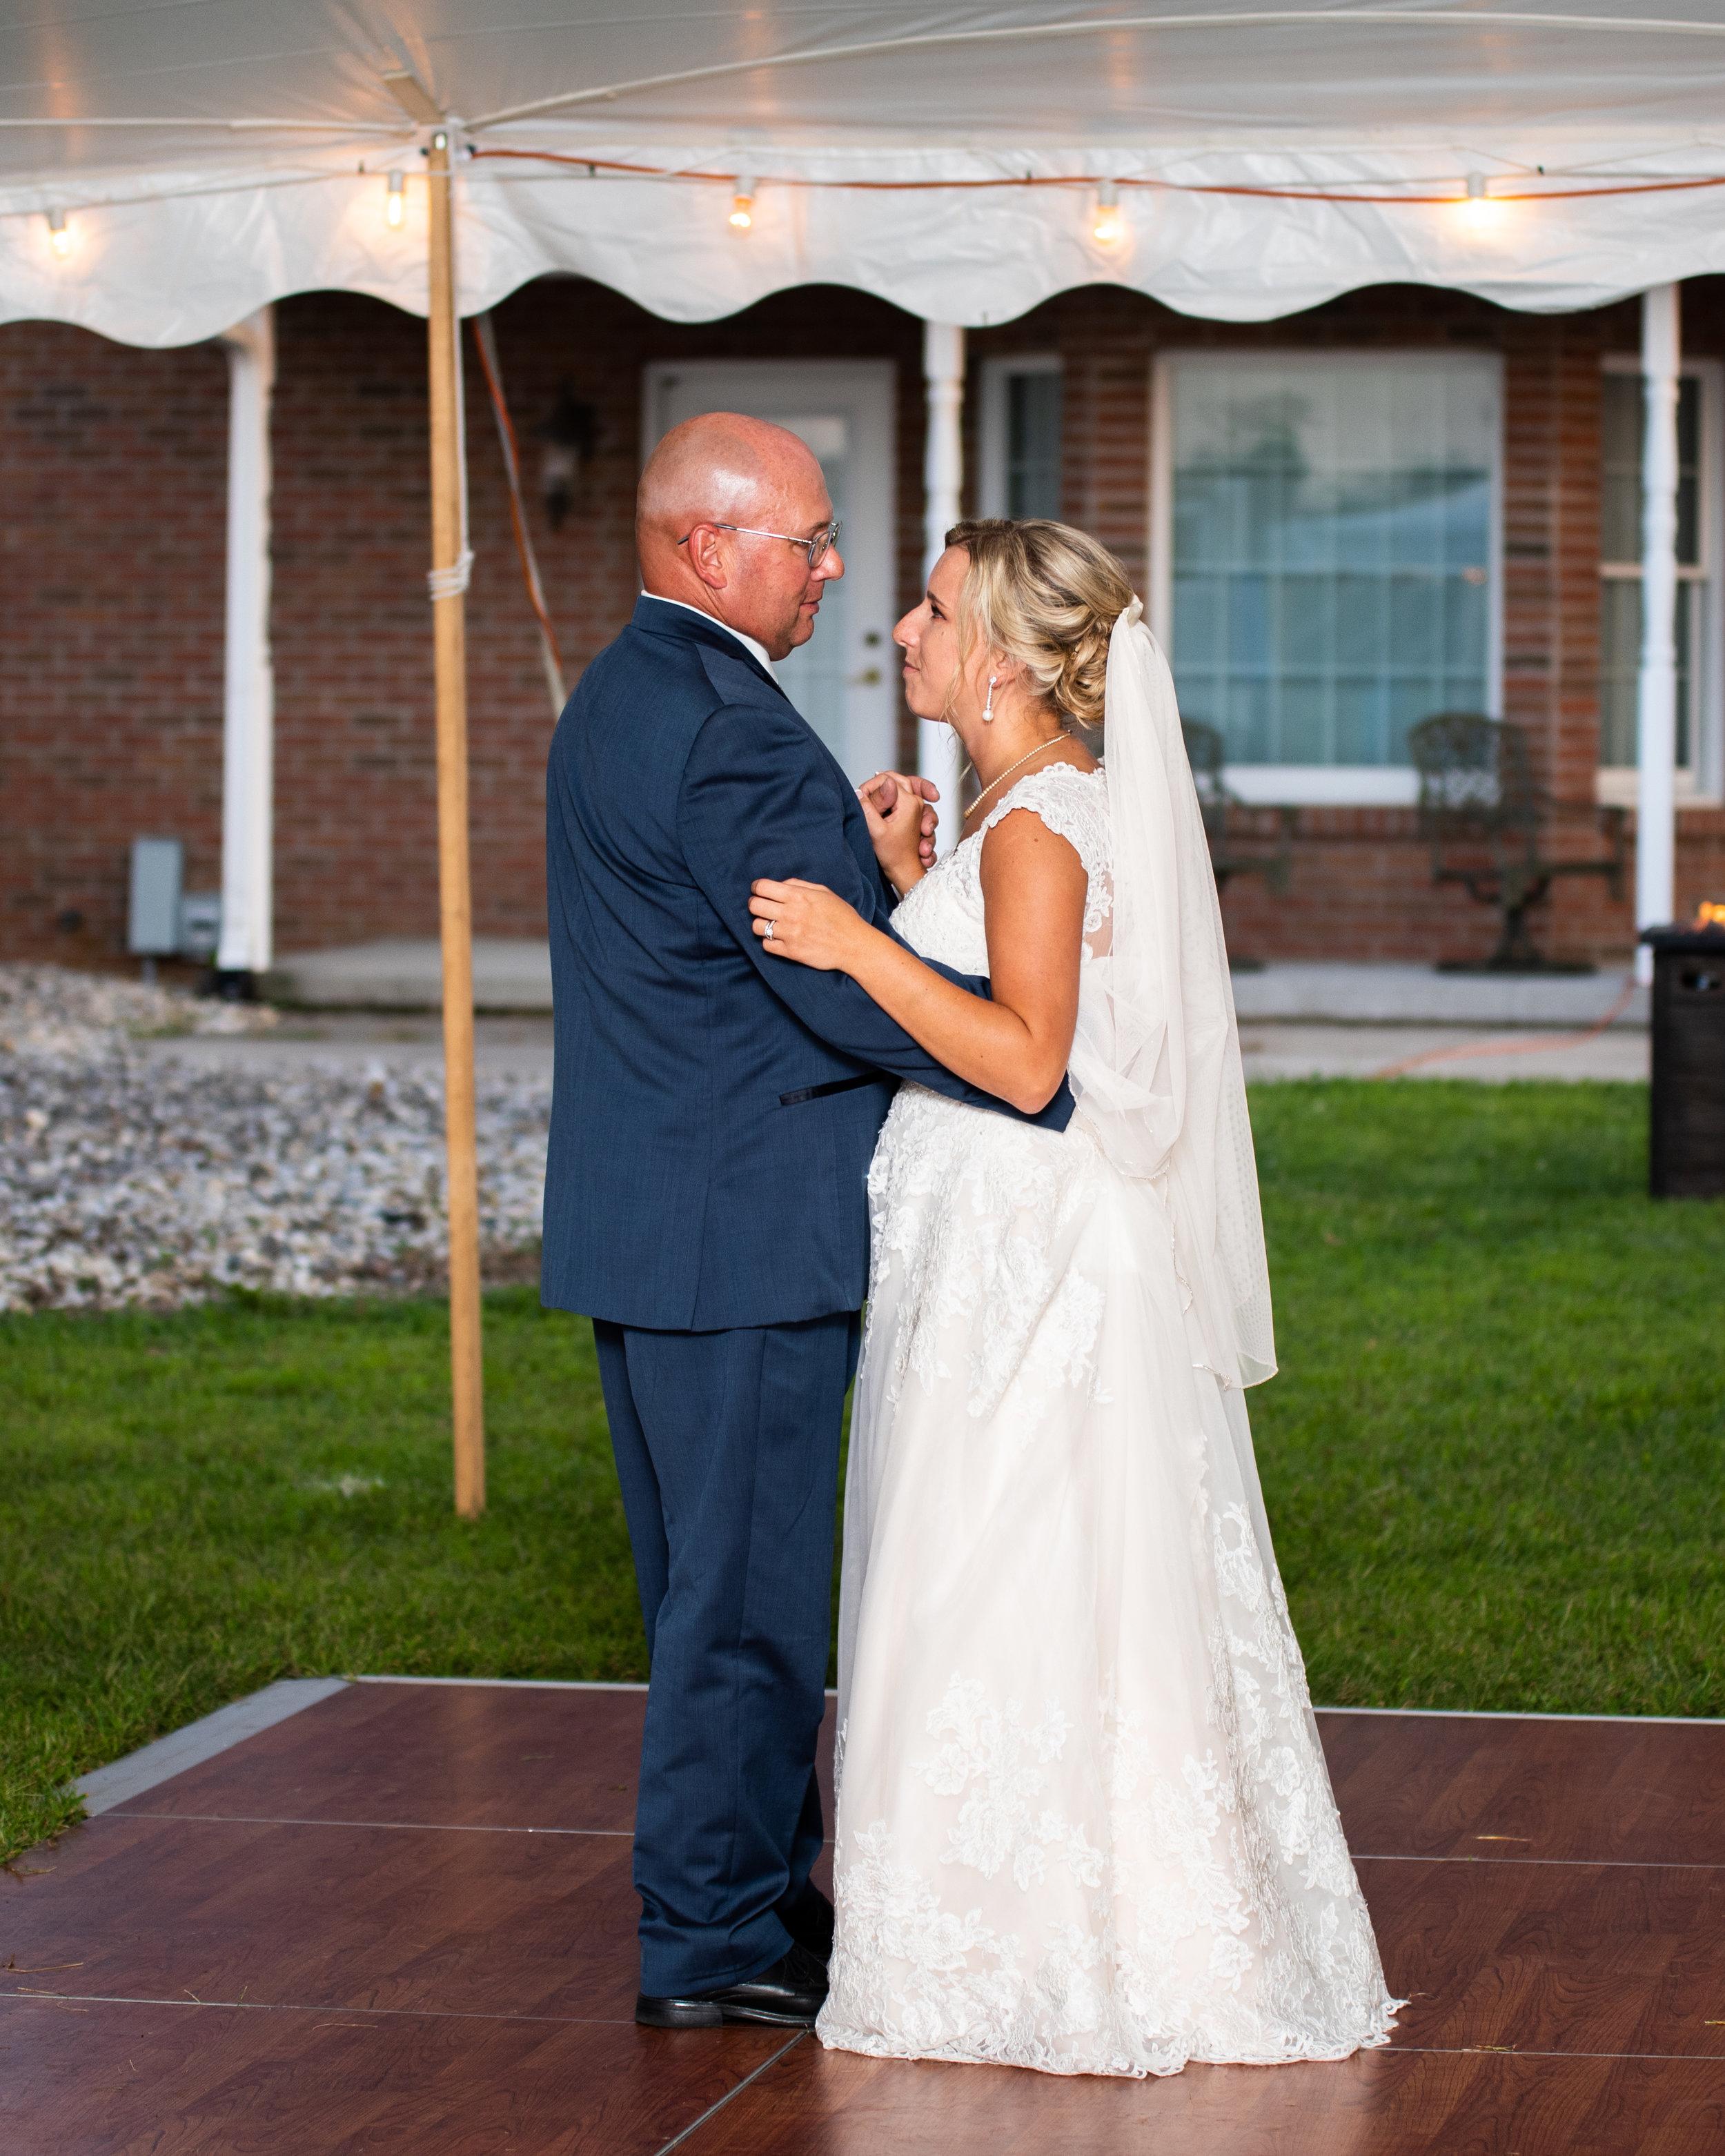 wedding (1 of 1)-213.jpg